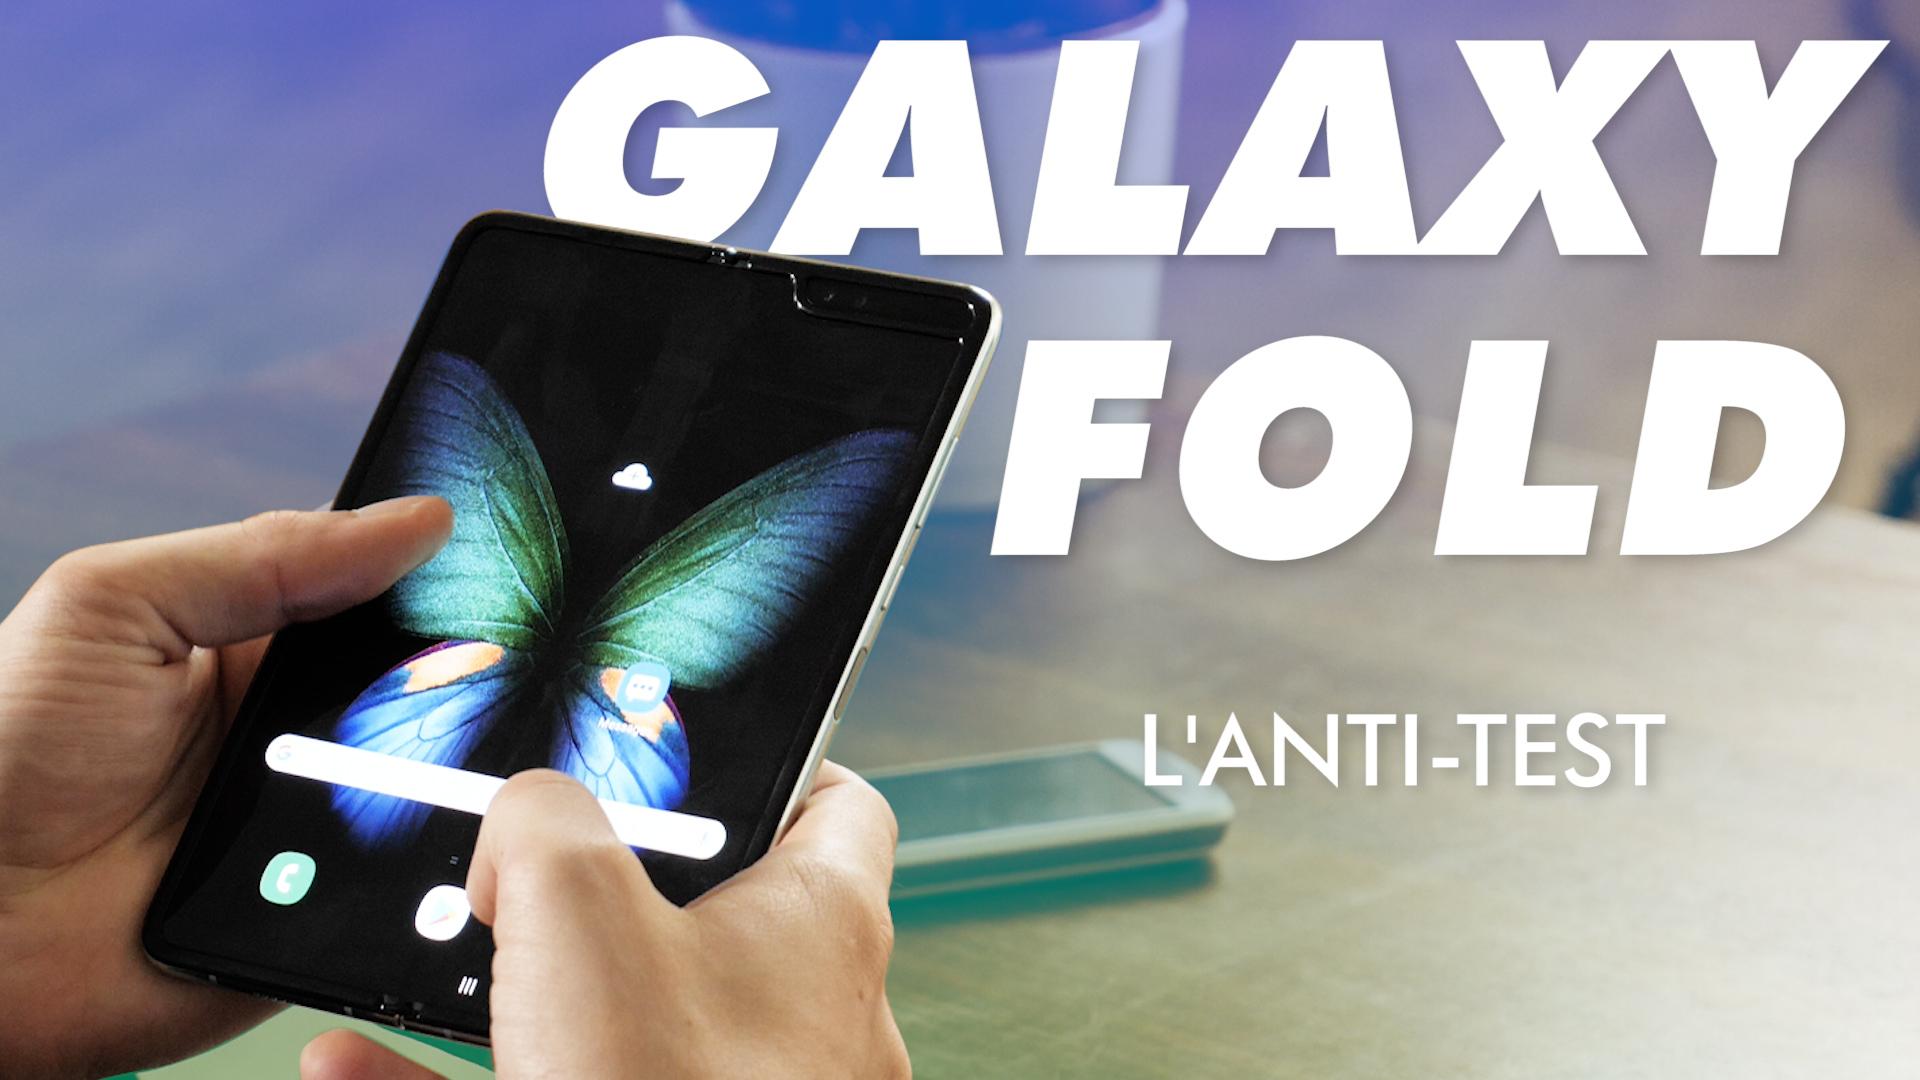 Galaxy Fold : que vaut le SMARTPHONE PLIABLE de Samsung ?